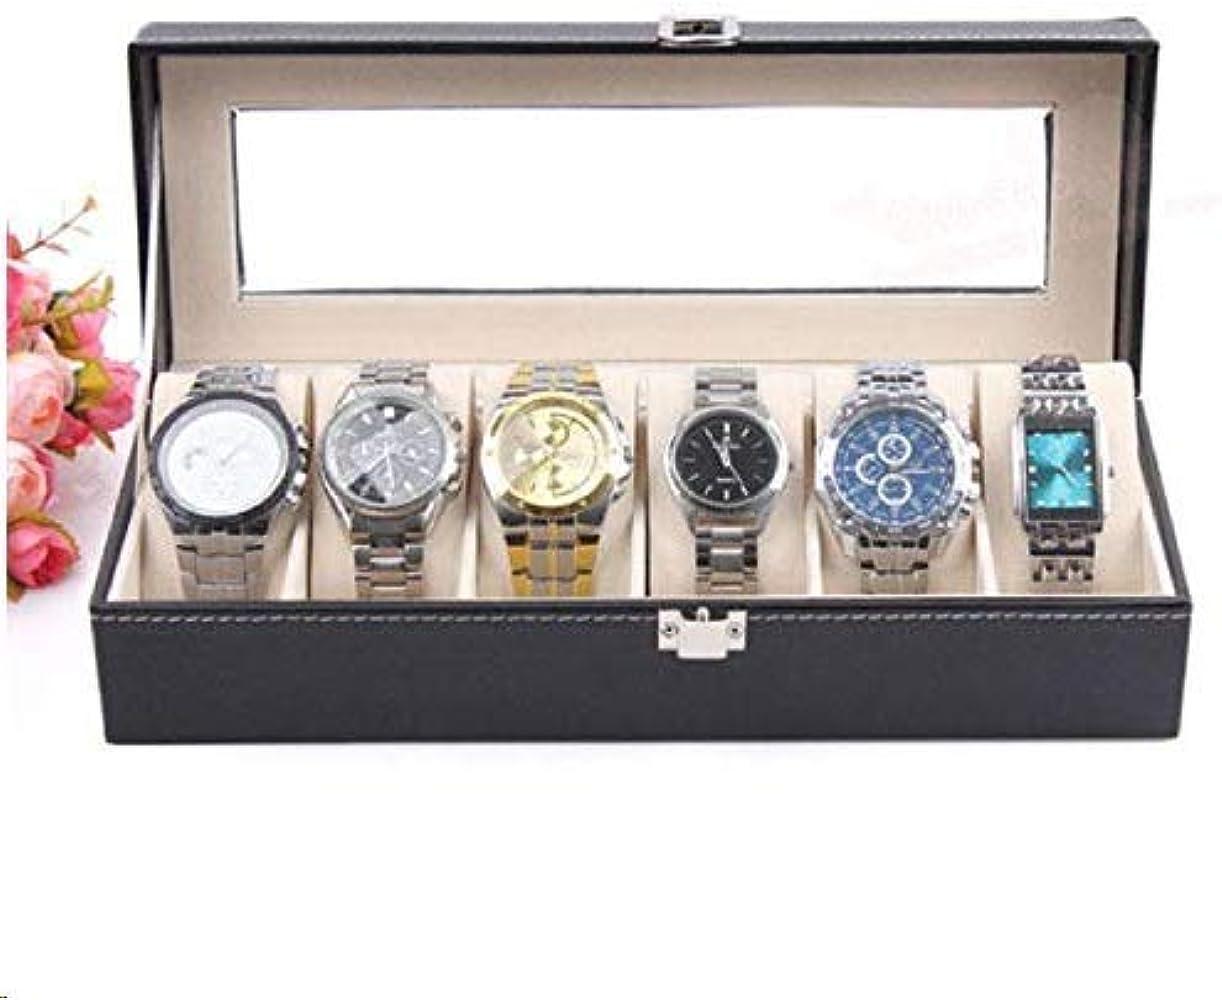 Caja De Relojes Relojero Joyero Piel PU 6 Compartimentos Soporte ...